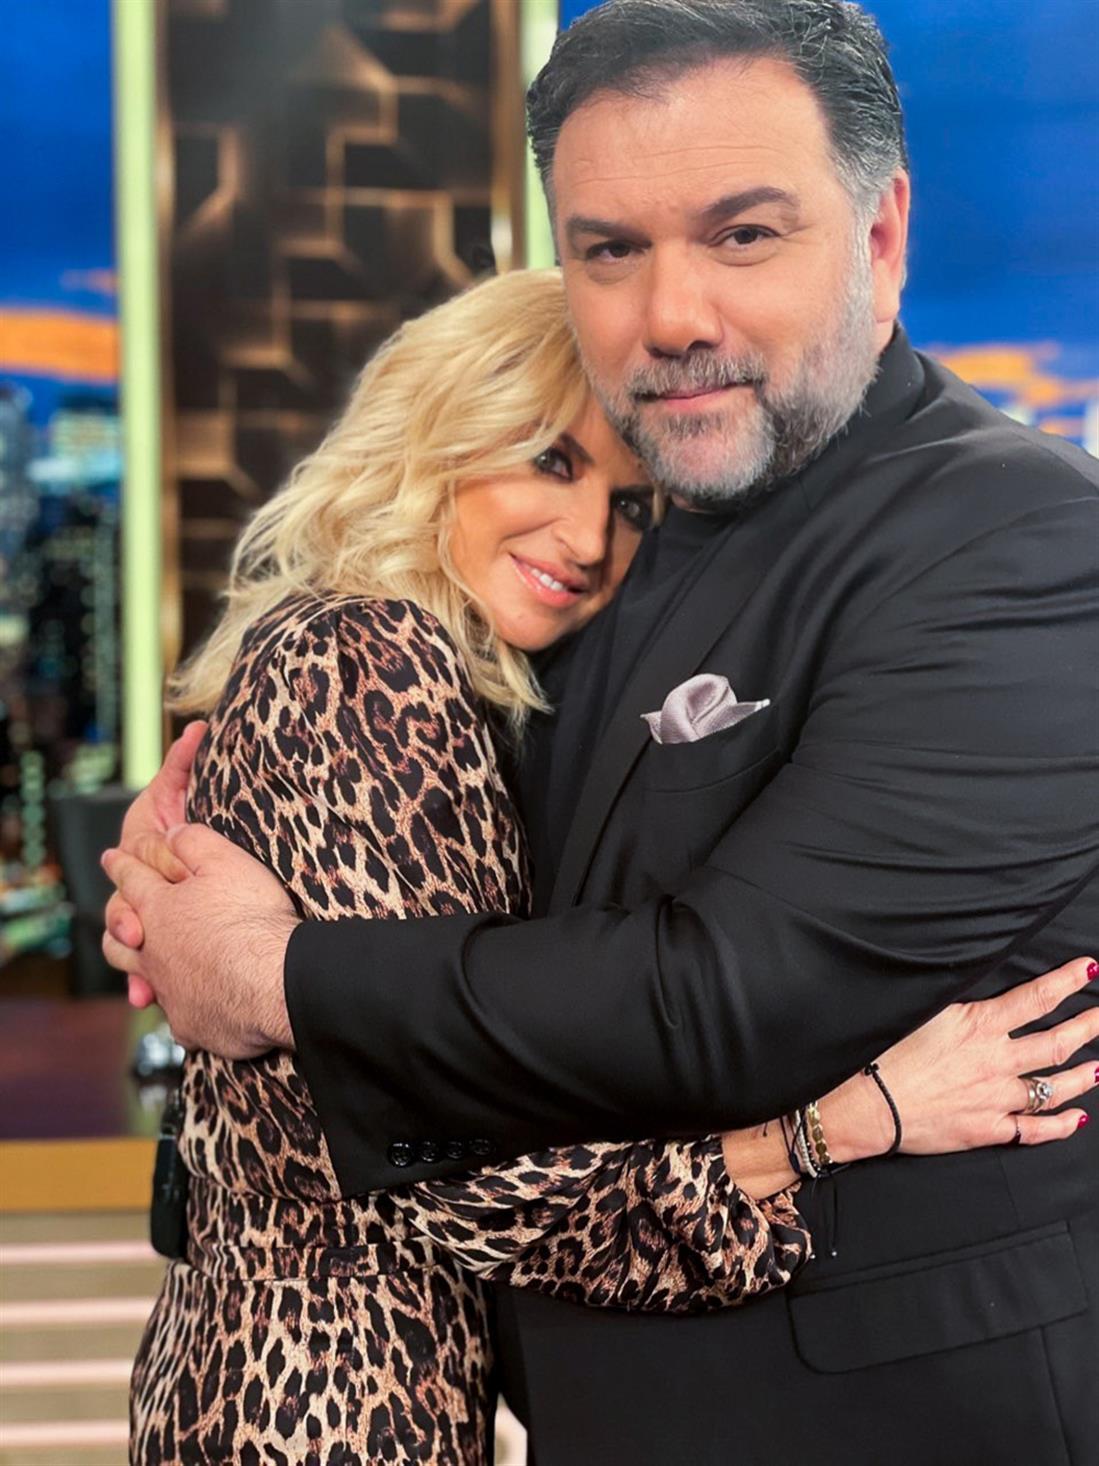 2Night Show - Γρηγόρης Αρναούτογλου - Μαρία Μπεκατώρου